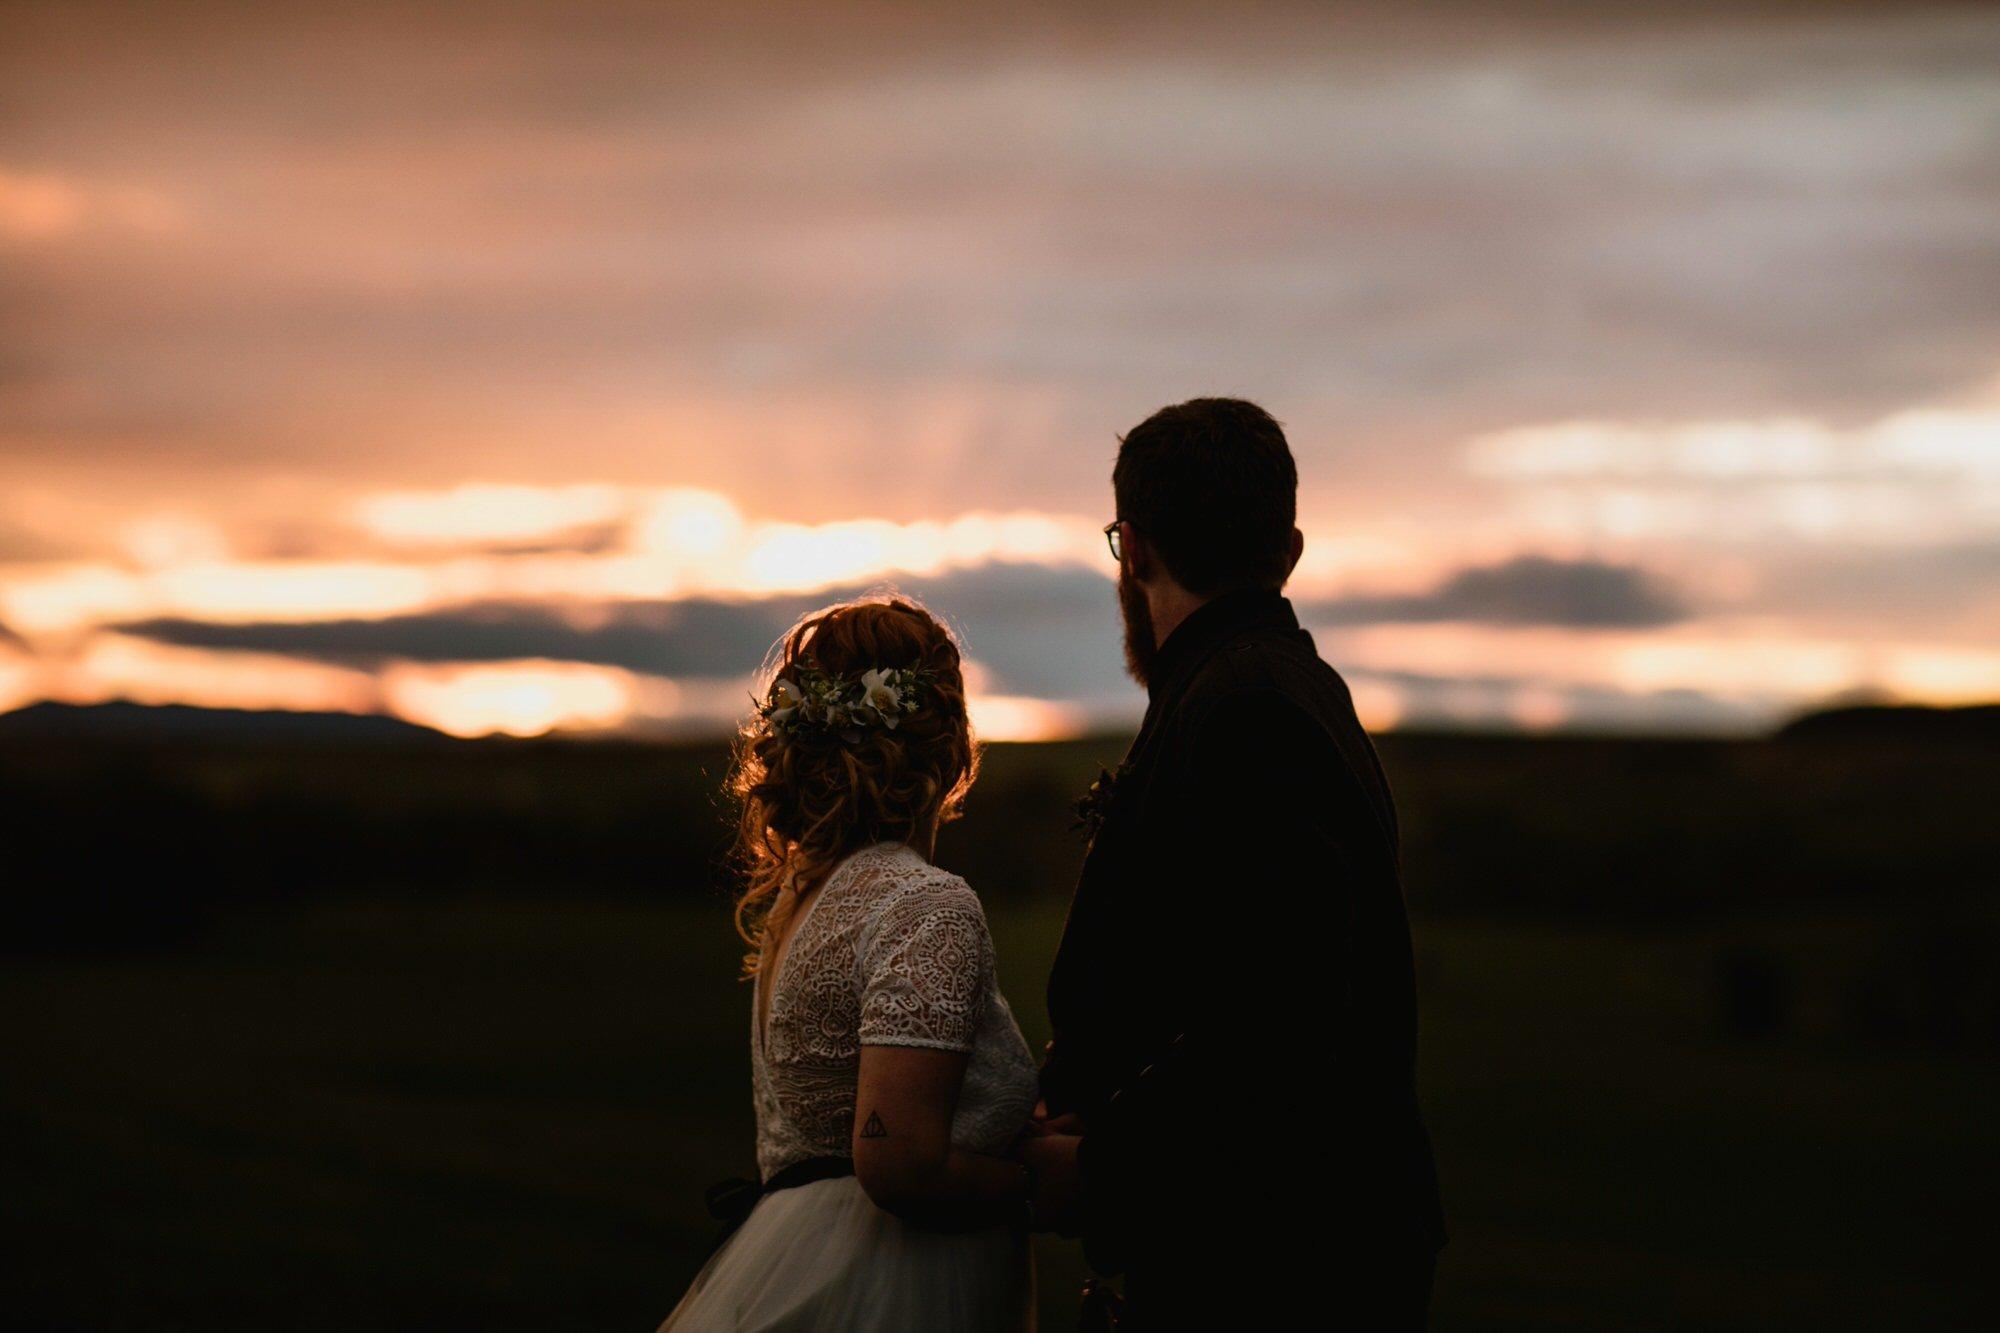 070 TIN SHED KNOCKRAICH WEDDING AUSTRIAN SCOTTISH ZOE ALEXANDRA PHOTOGRAPHY